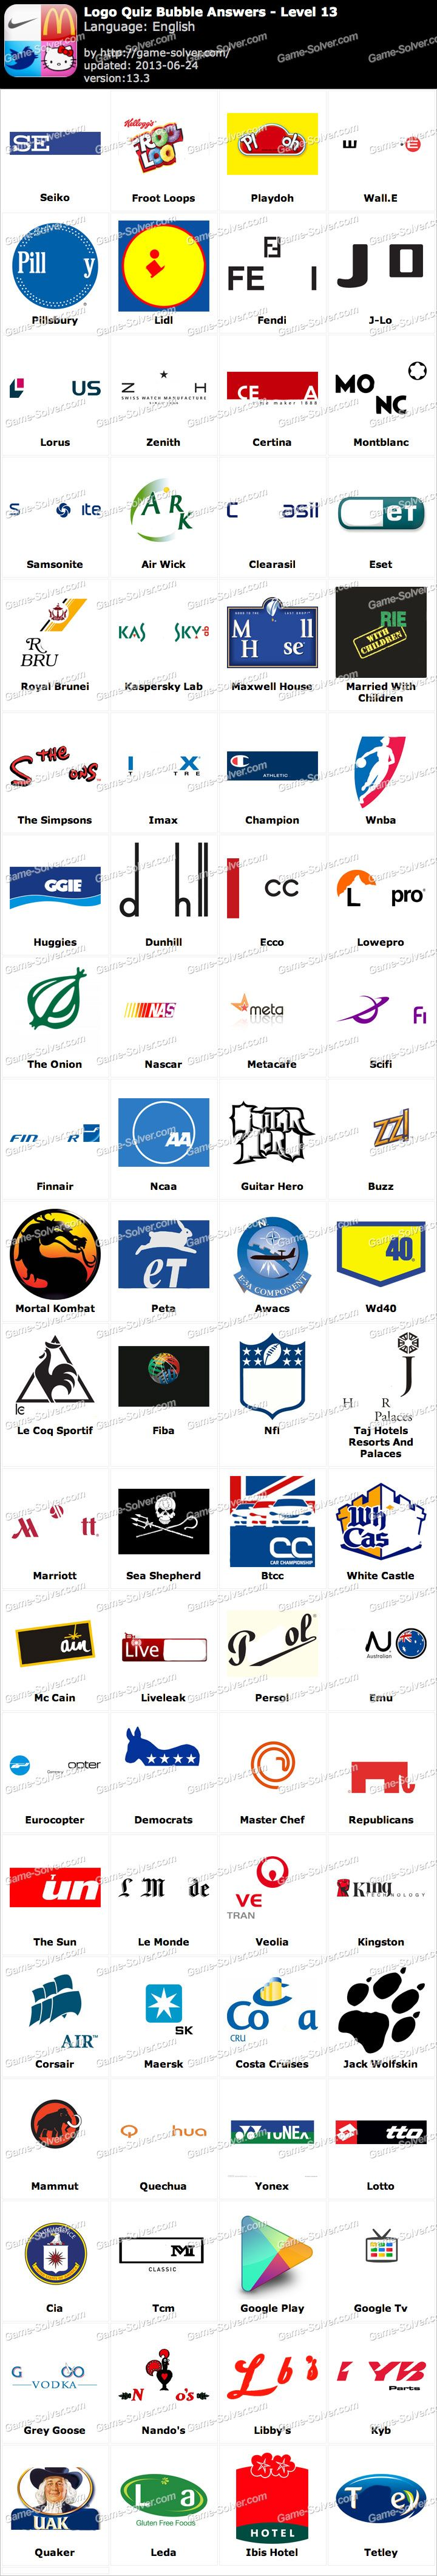 Logo game guess the brand bonus fashion doors geek - Logo Quiz By Bubble Answers Level 13